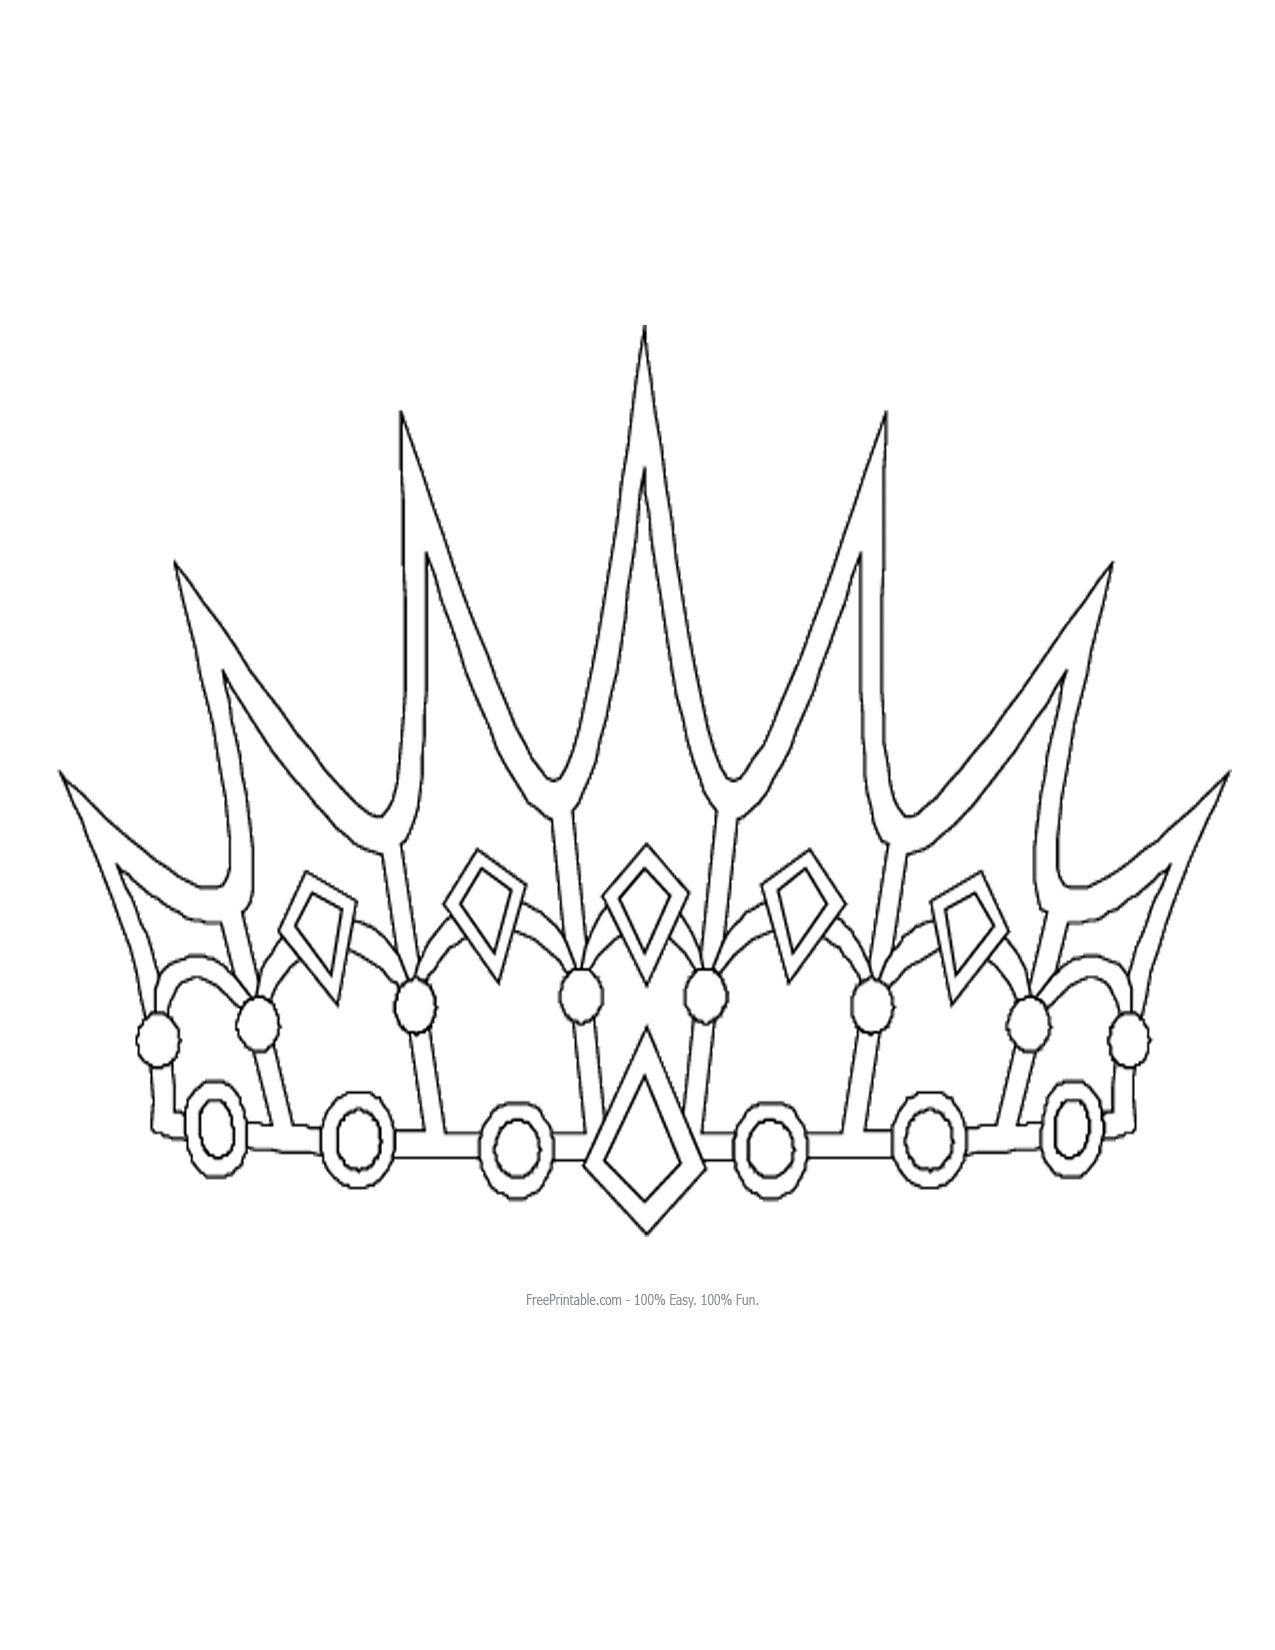 Free Printable Princess Crown Shapes | Print - Princess Crown | 3D - Free Printable Crown